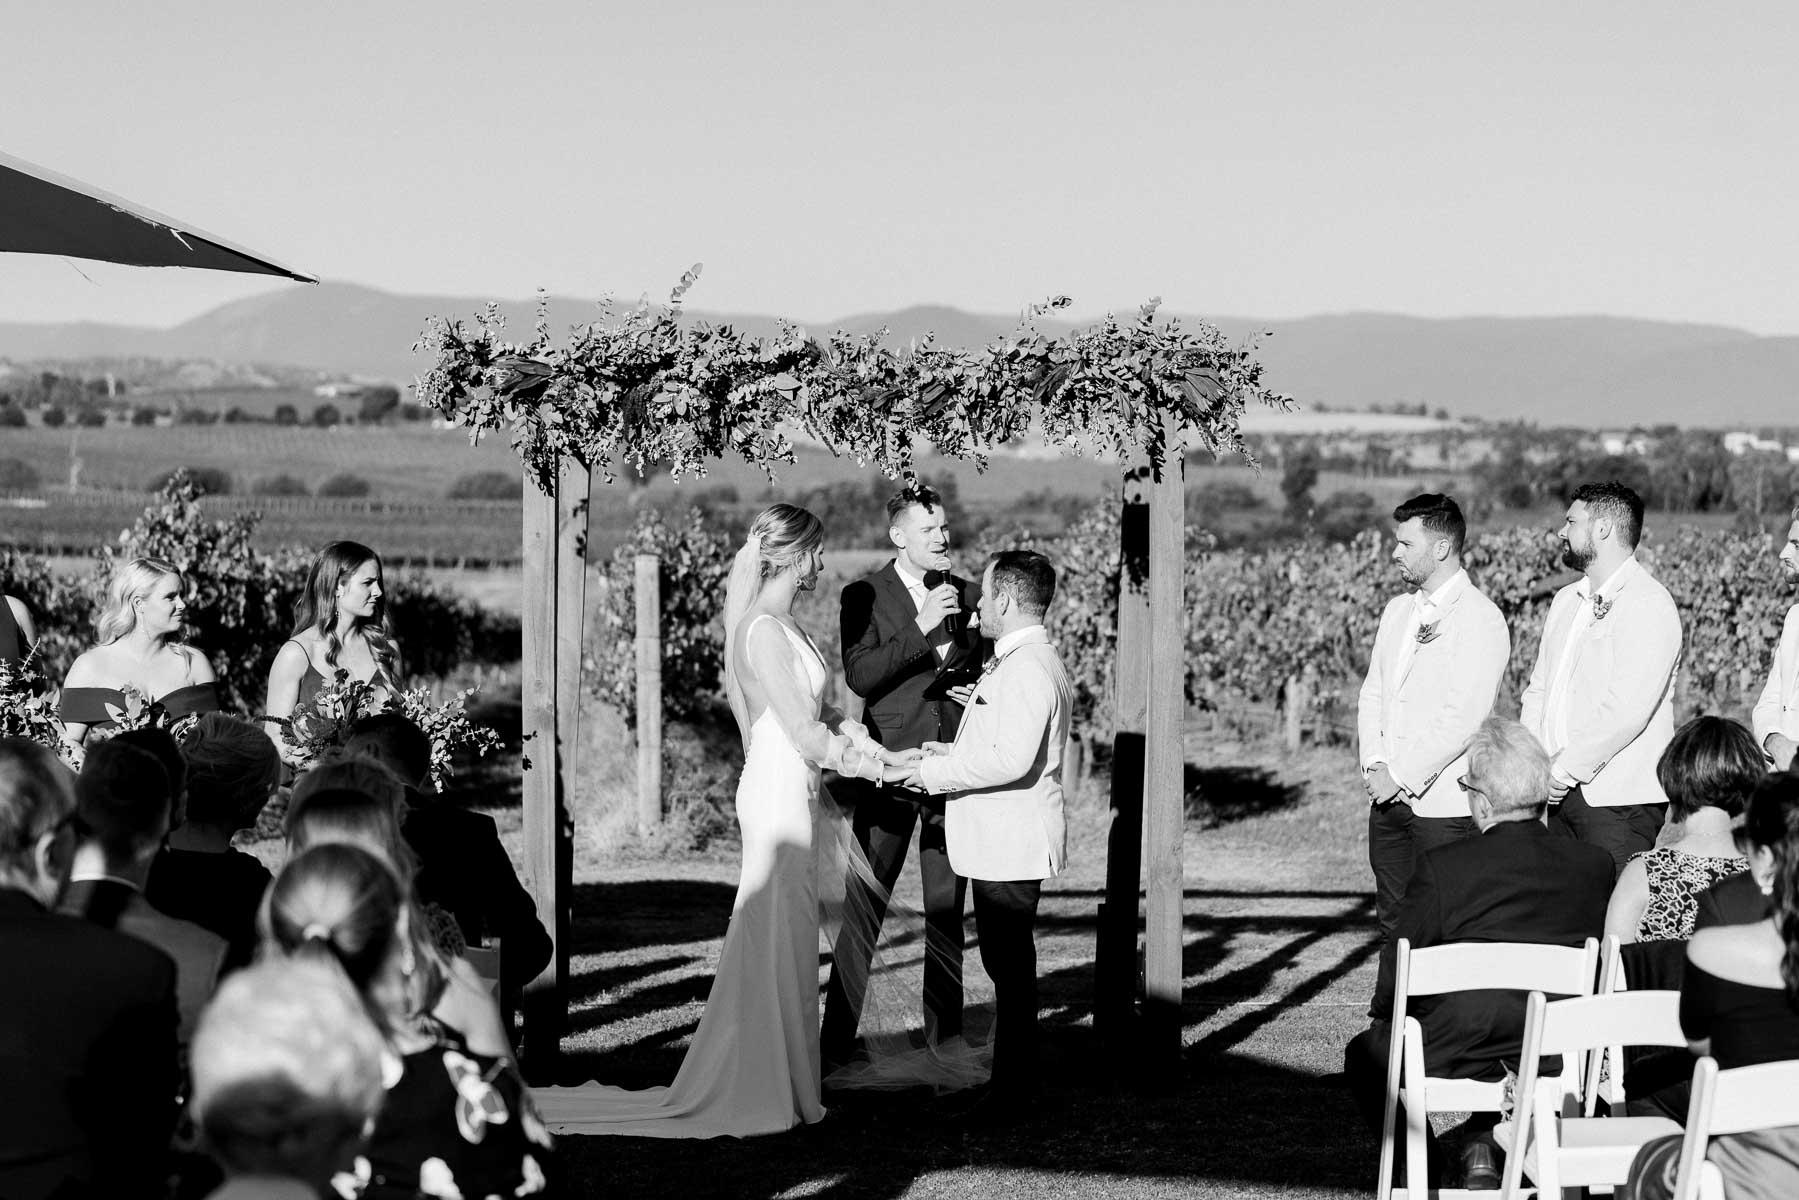 rustic-yarra-valley-wedding-venue-acacia-ridge-georgia-james-08063.jpg